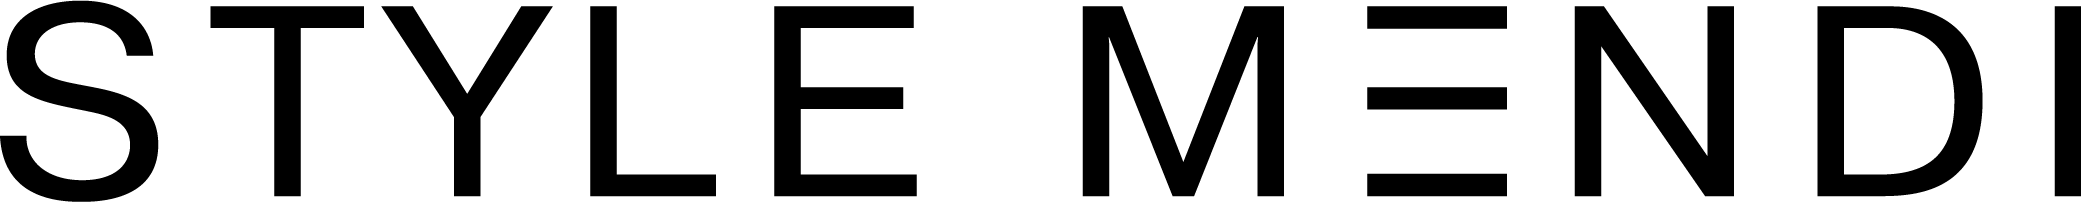 Stylemendi Big logo